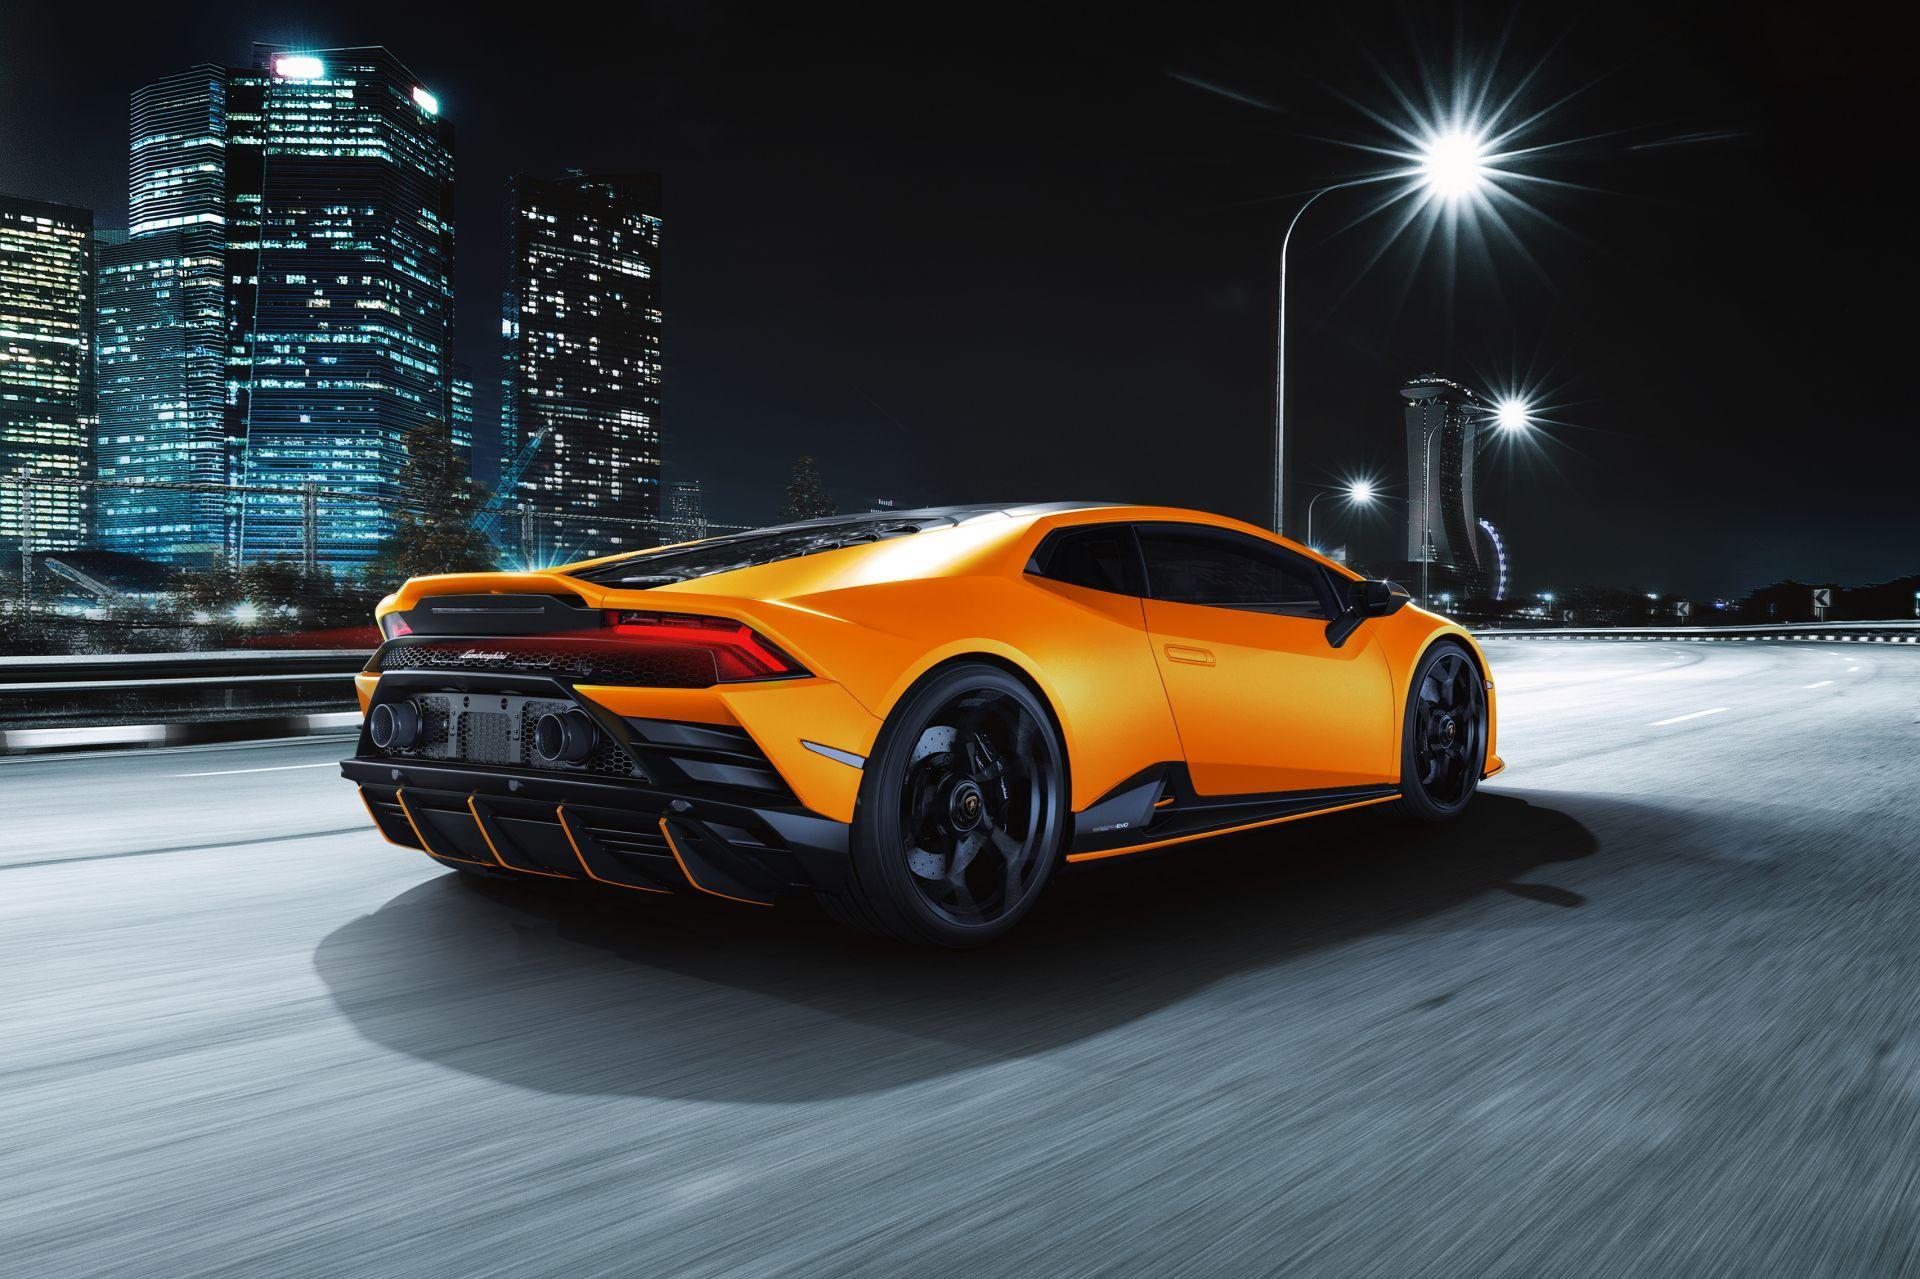 Lamborghini-Huracan-Evo-Fluo-Capsule-6